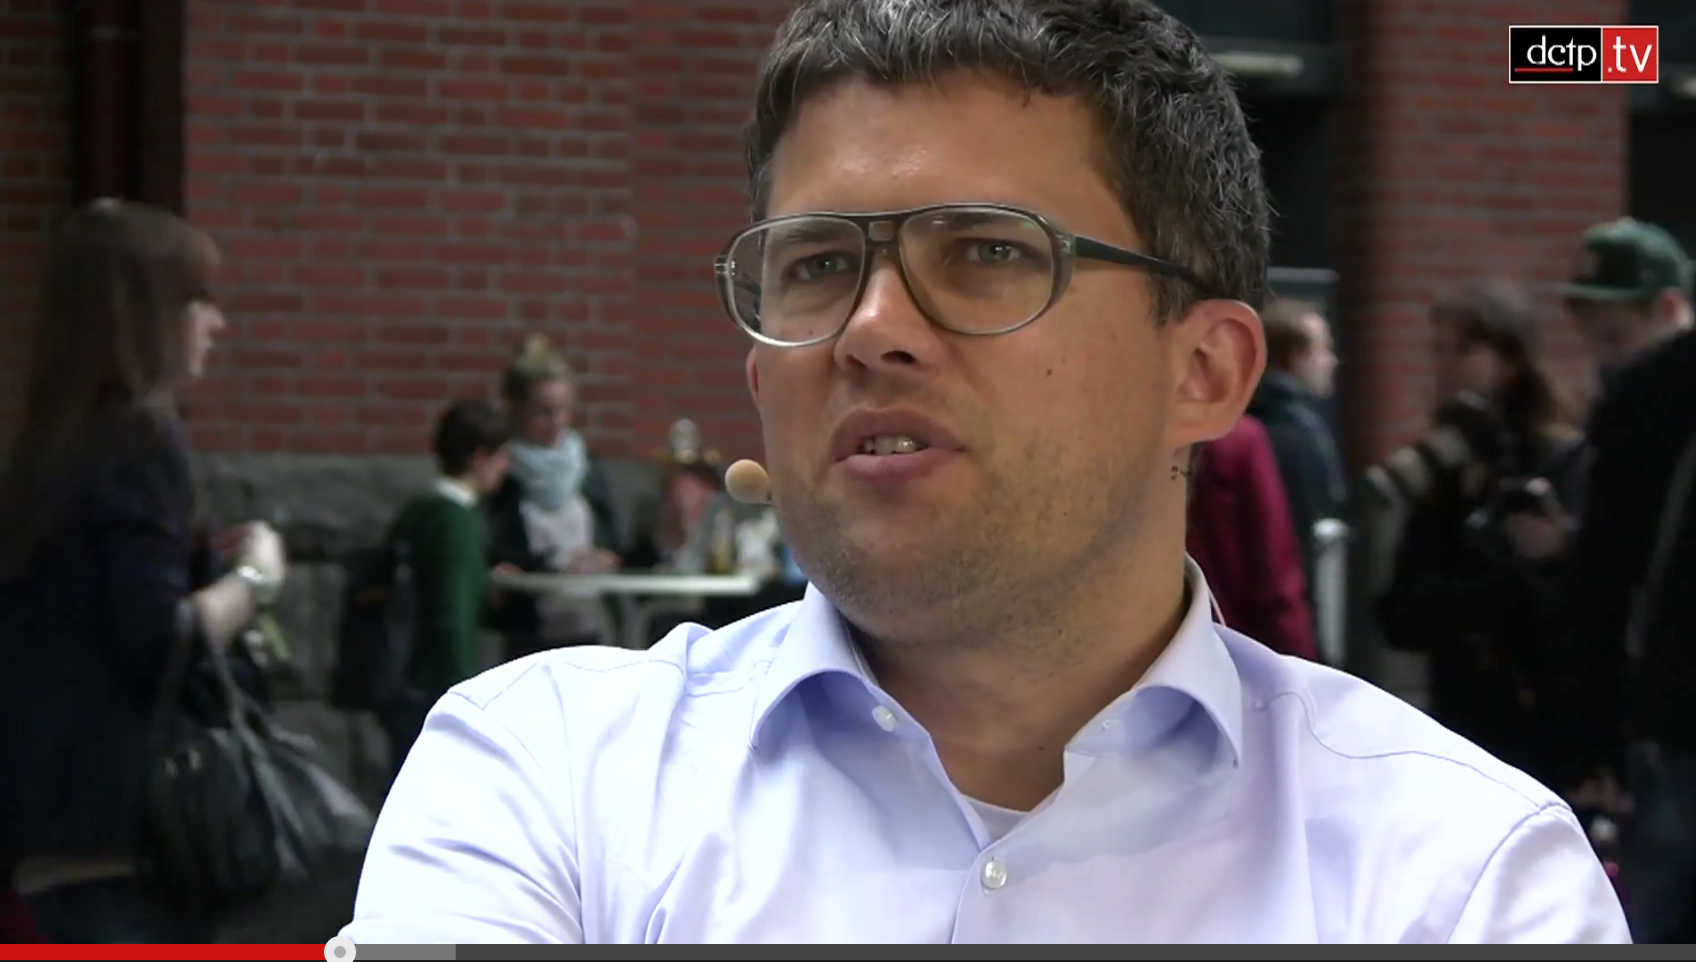 re:publica 2014 – Rückschau: Auf dem Interview-Grill